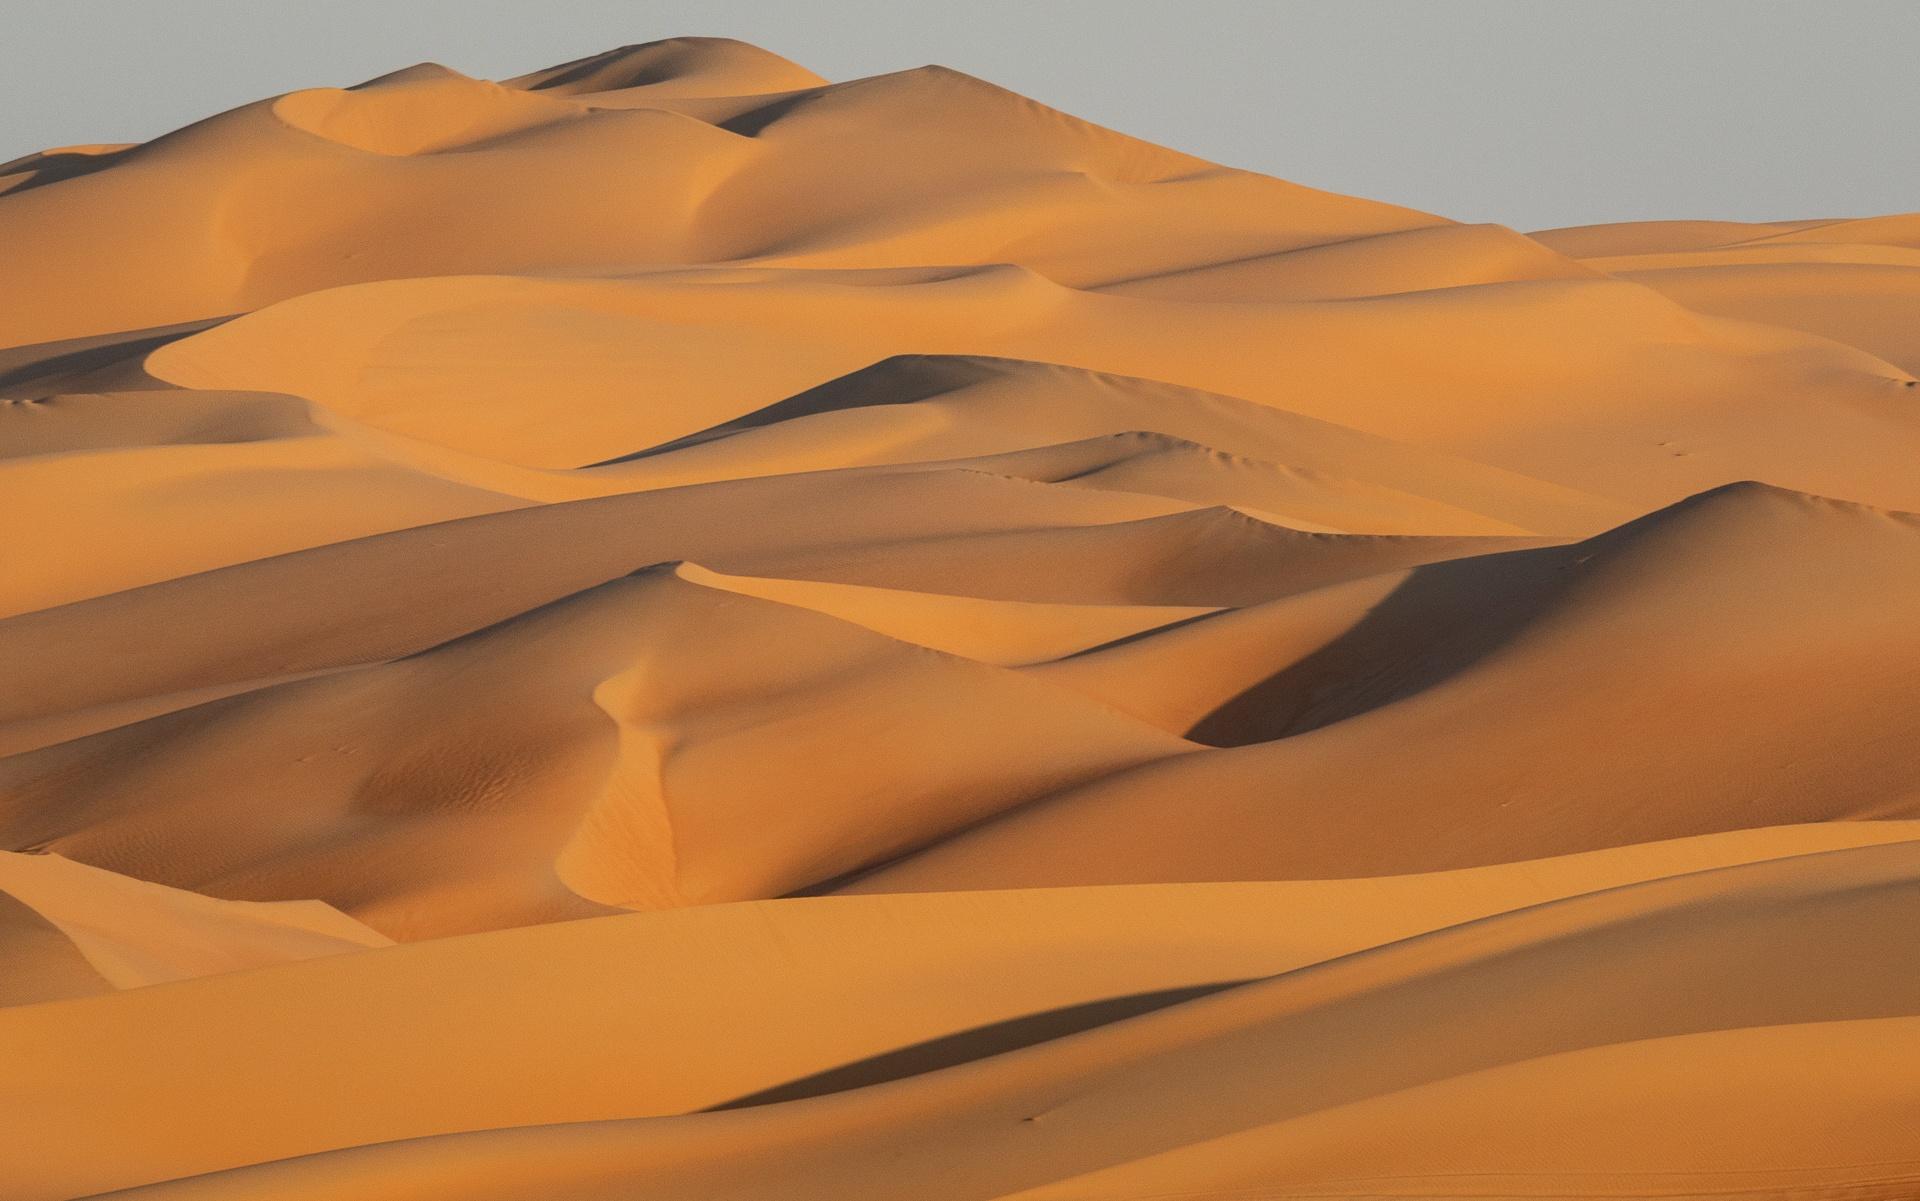 Mountainous sand dunes